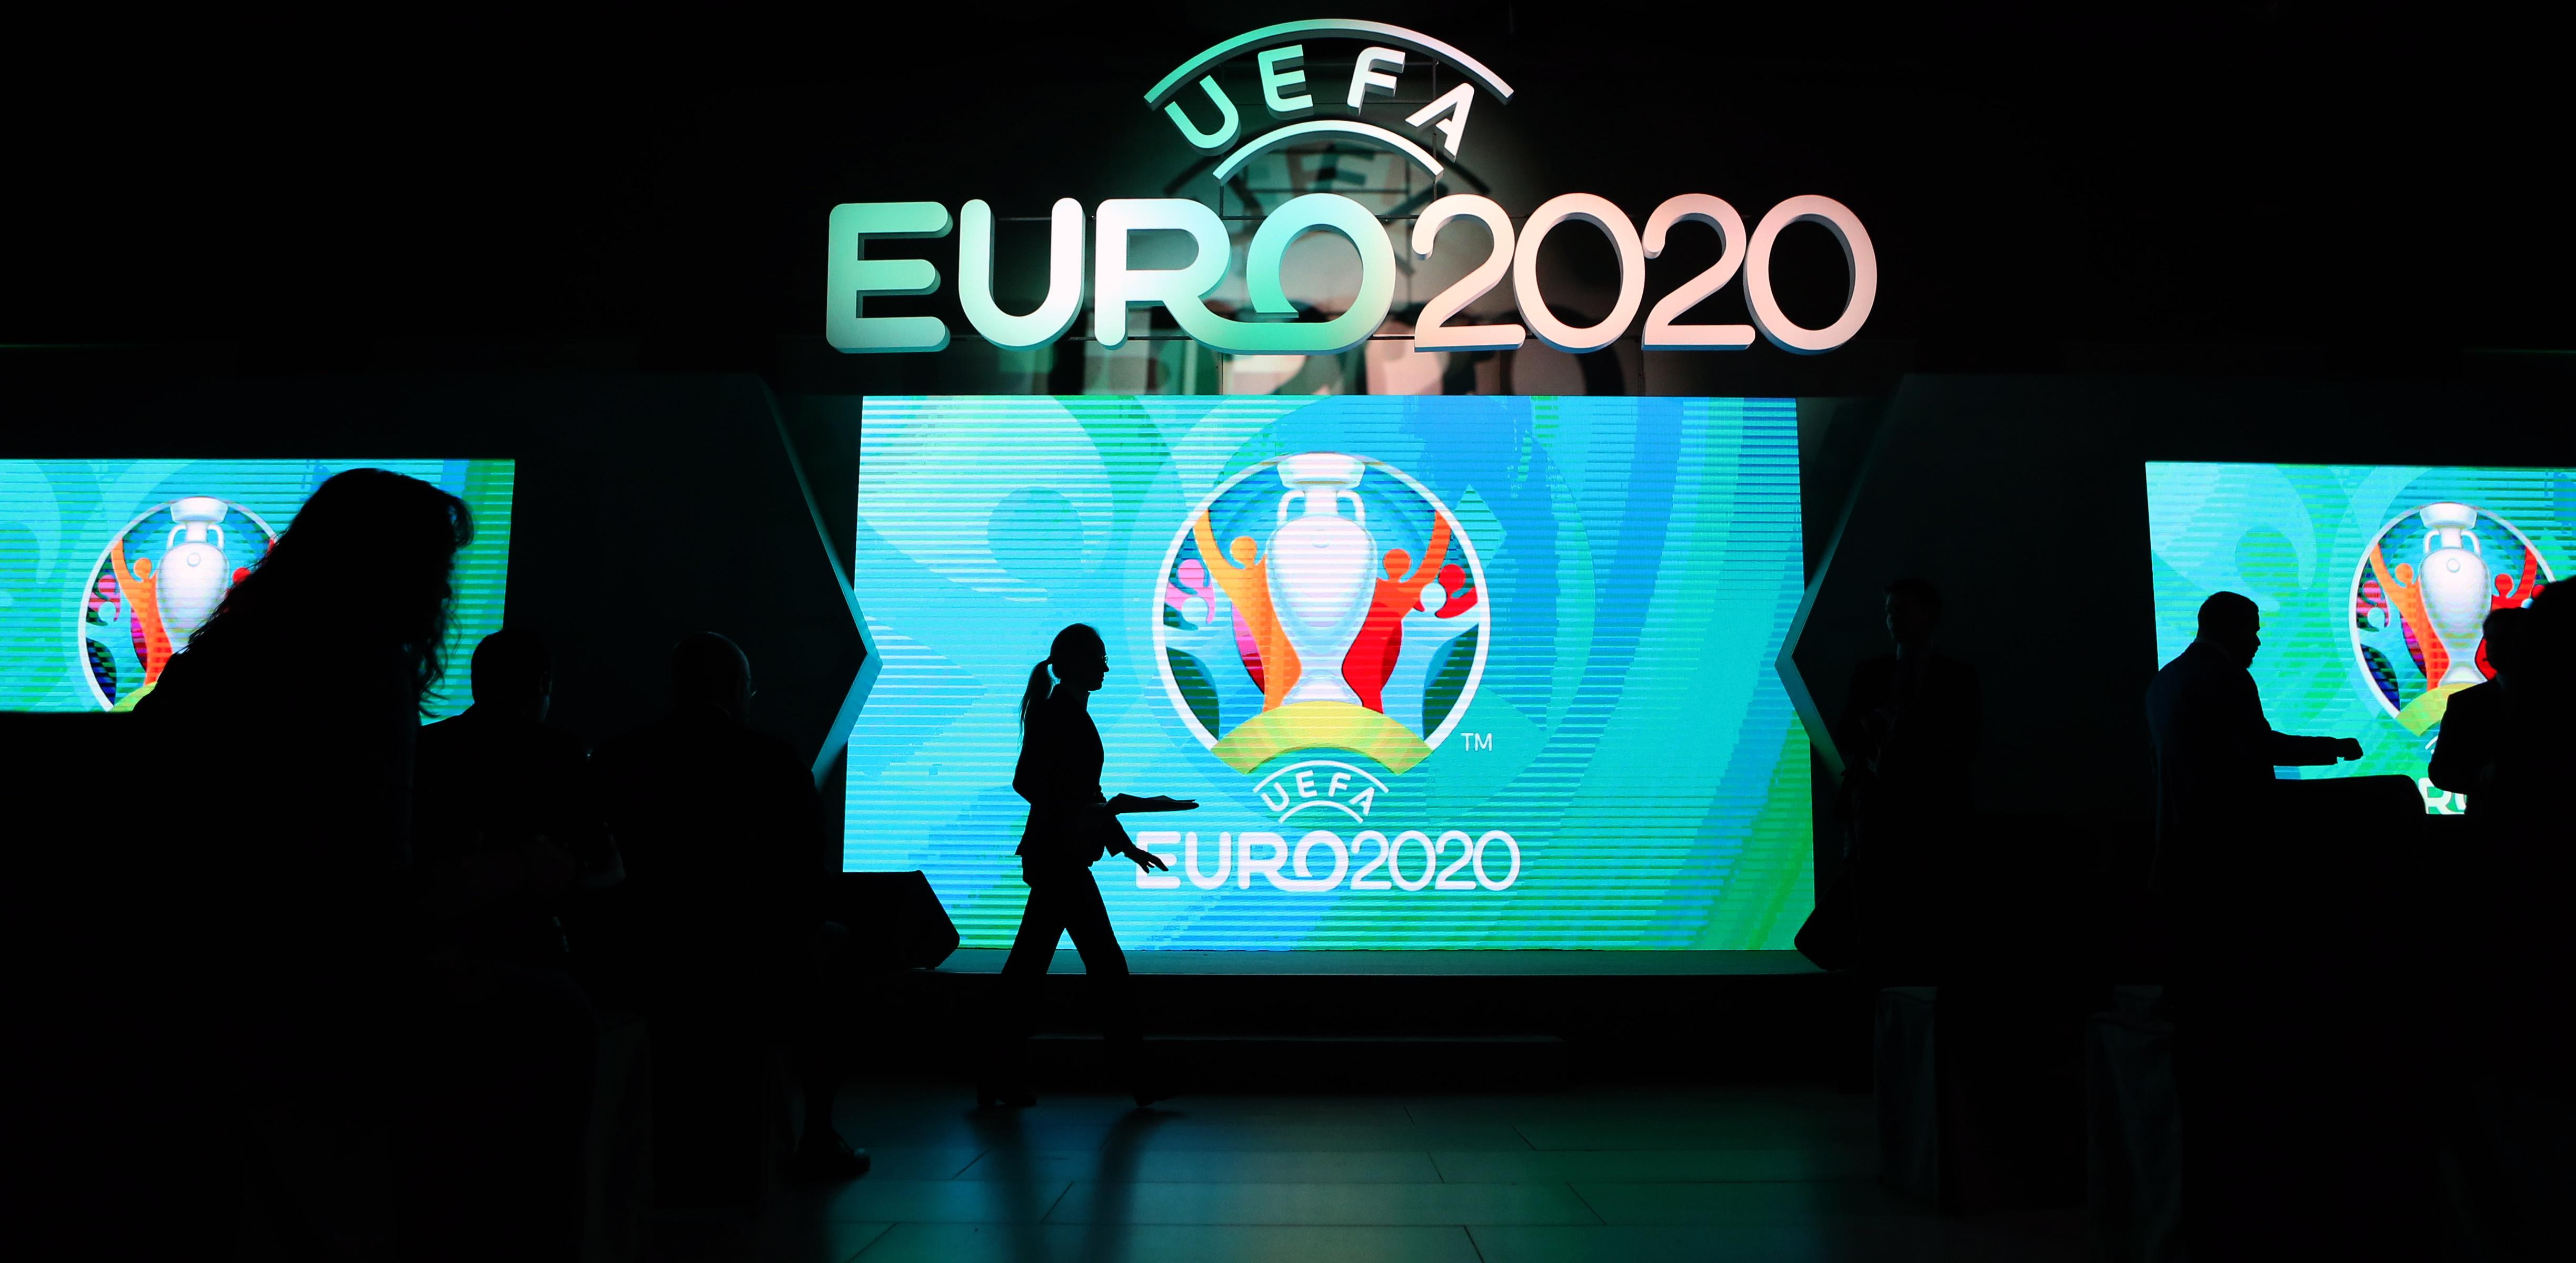 St Petersburg unveils UEFA Euro 2020 host city logo